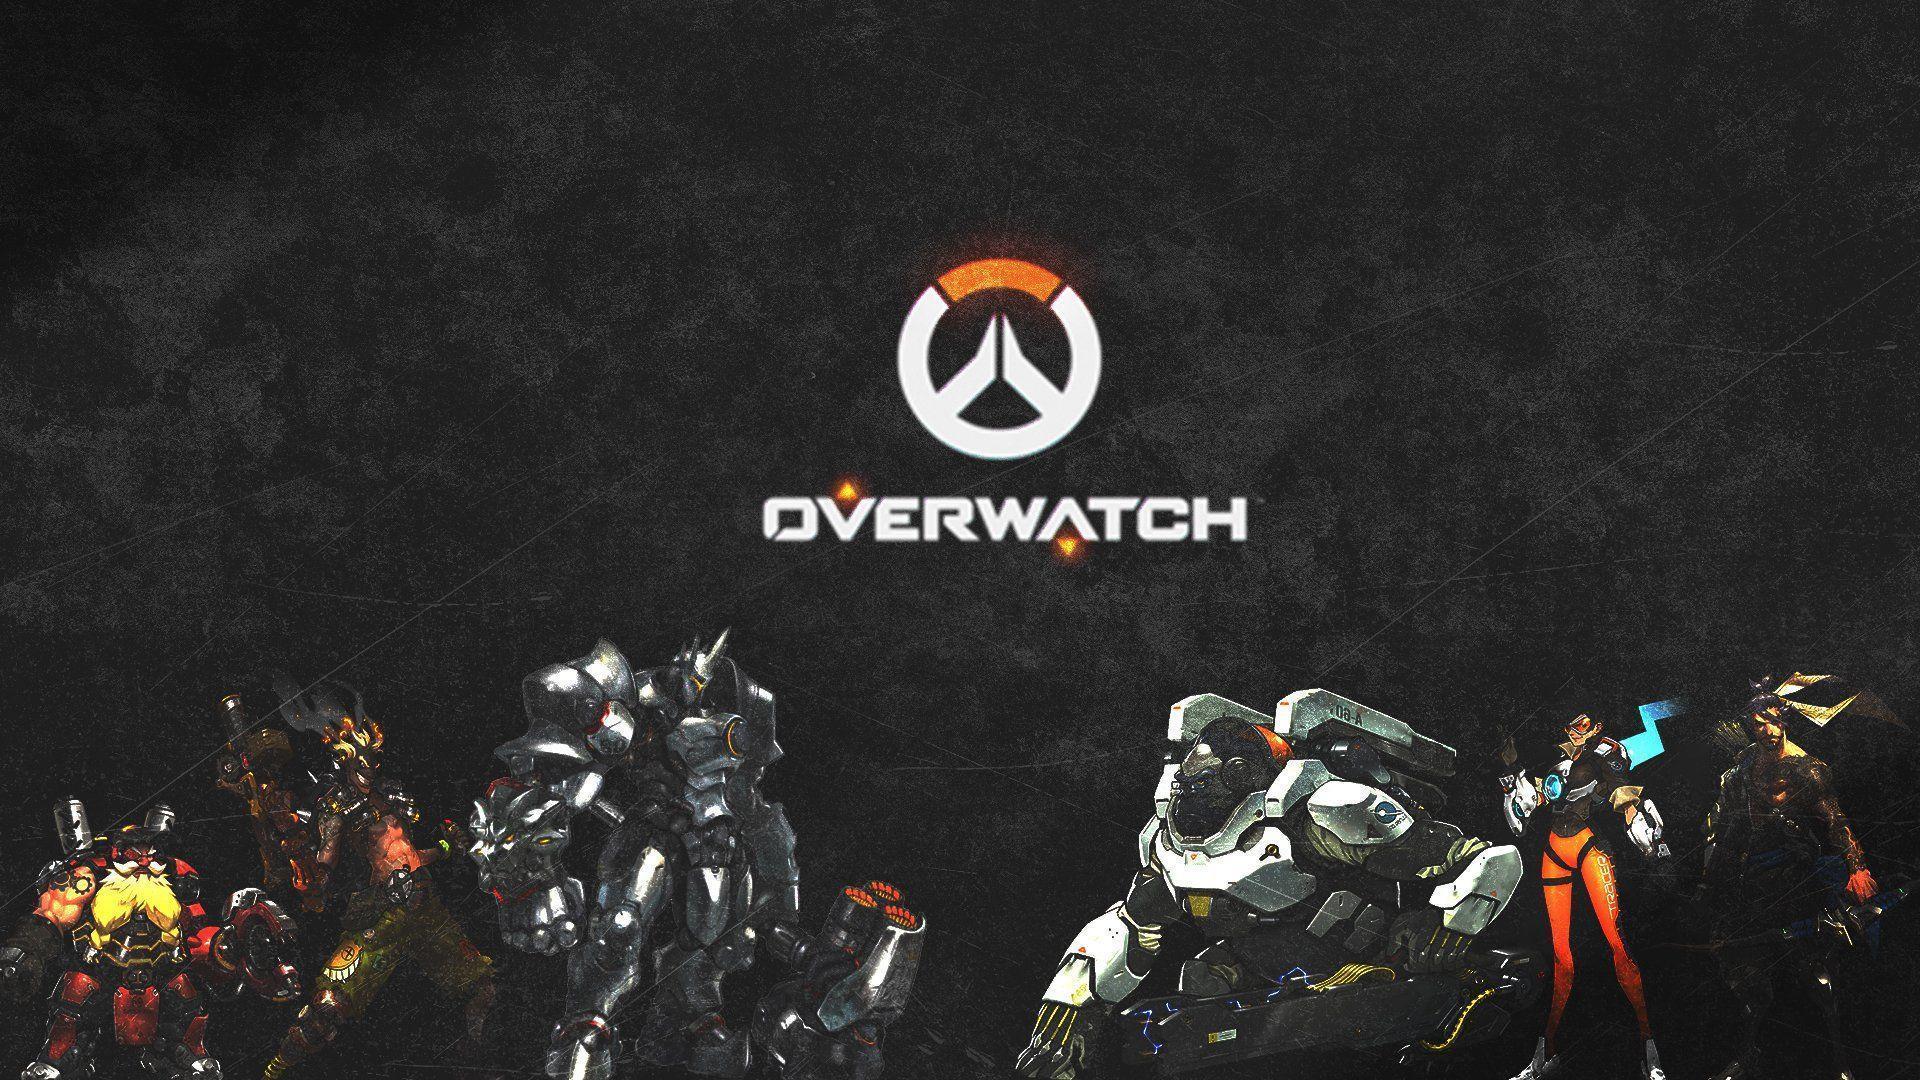 Overwatch Hd Wallpapers Wallpaper Cave